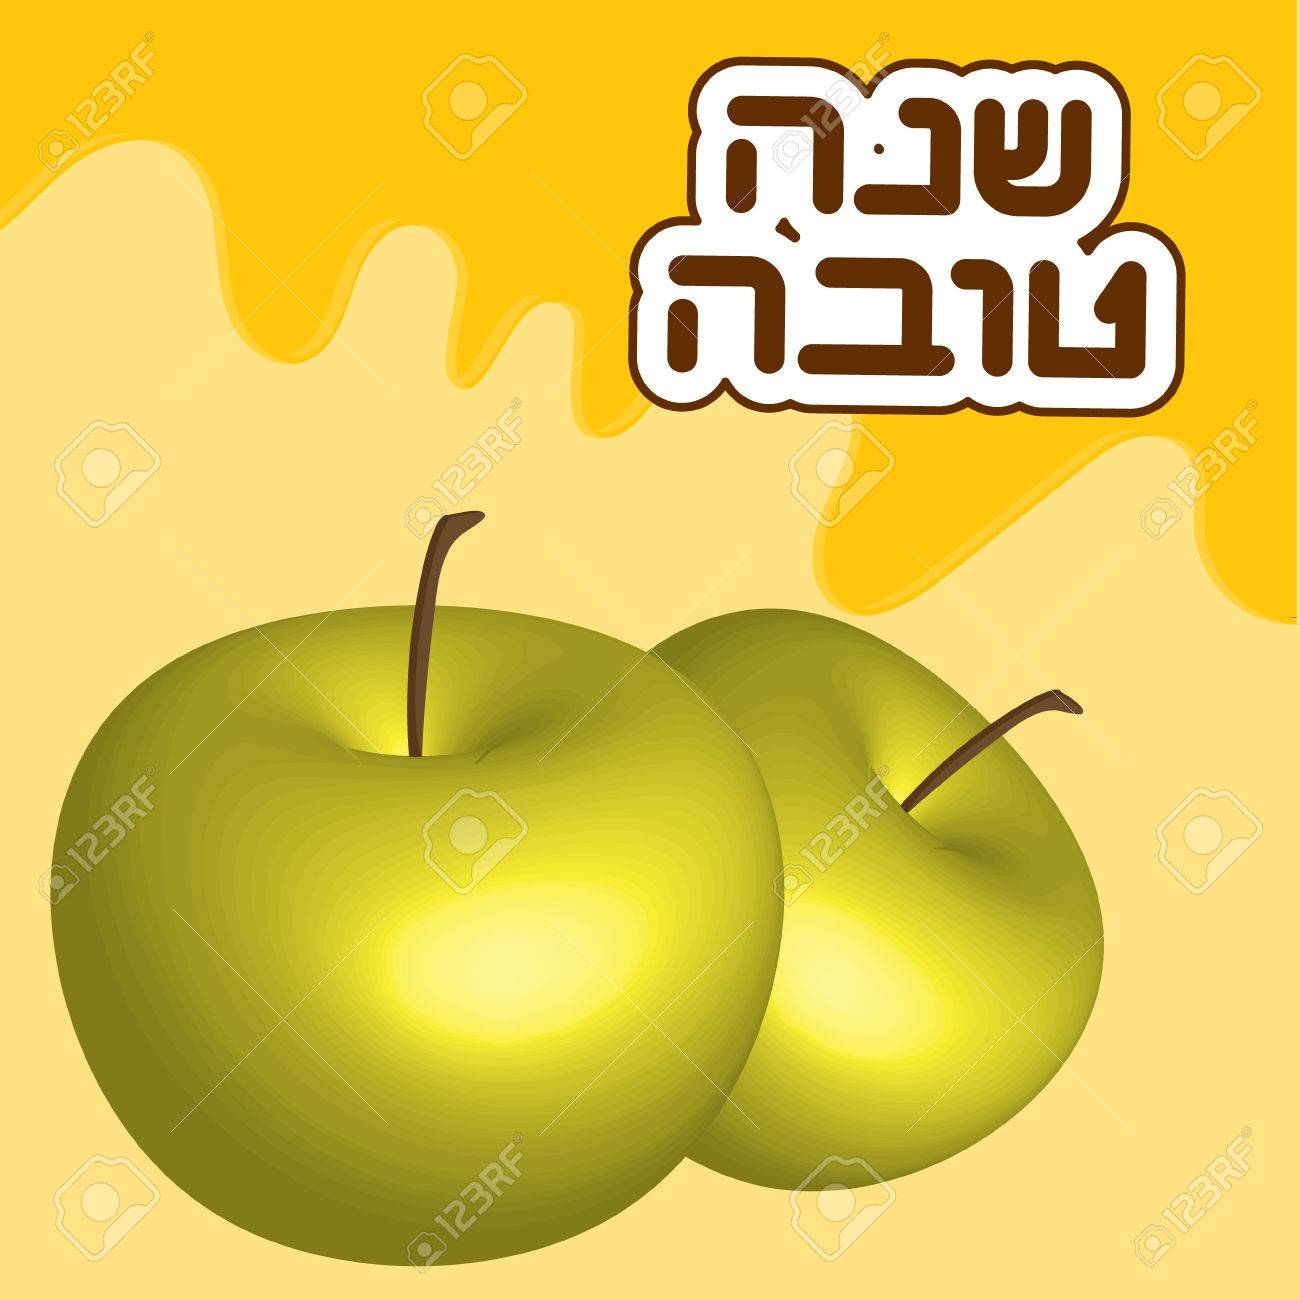 Rosh hashanah jewish new year greeting card with apples hebrew rosh hashanah jewish new year greeting card with apples hebrew text m4hsunfo